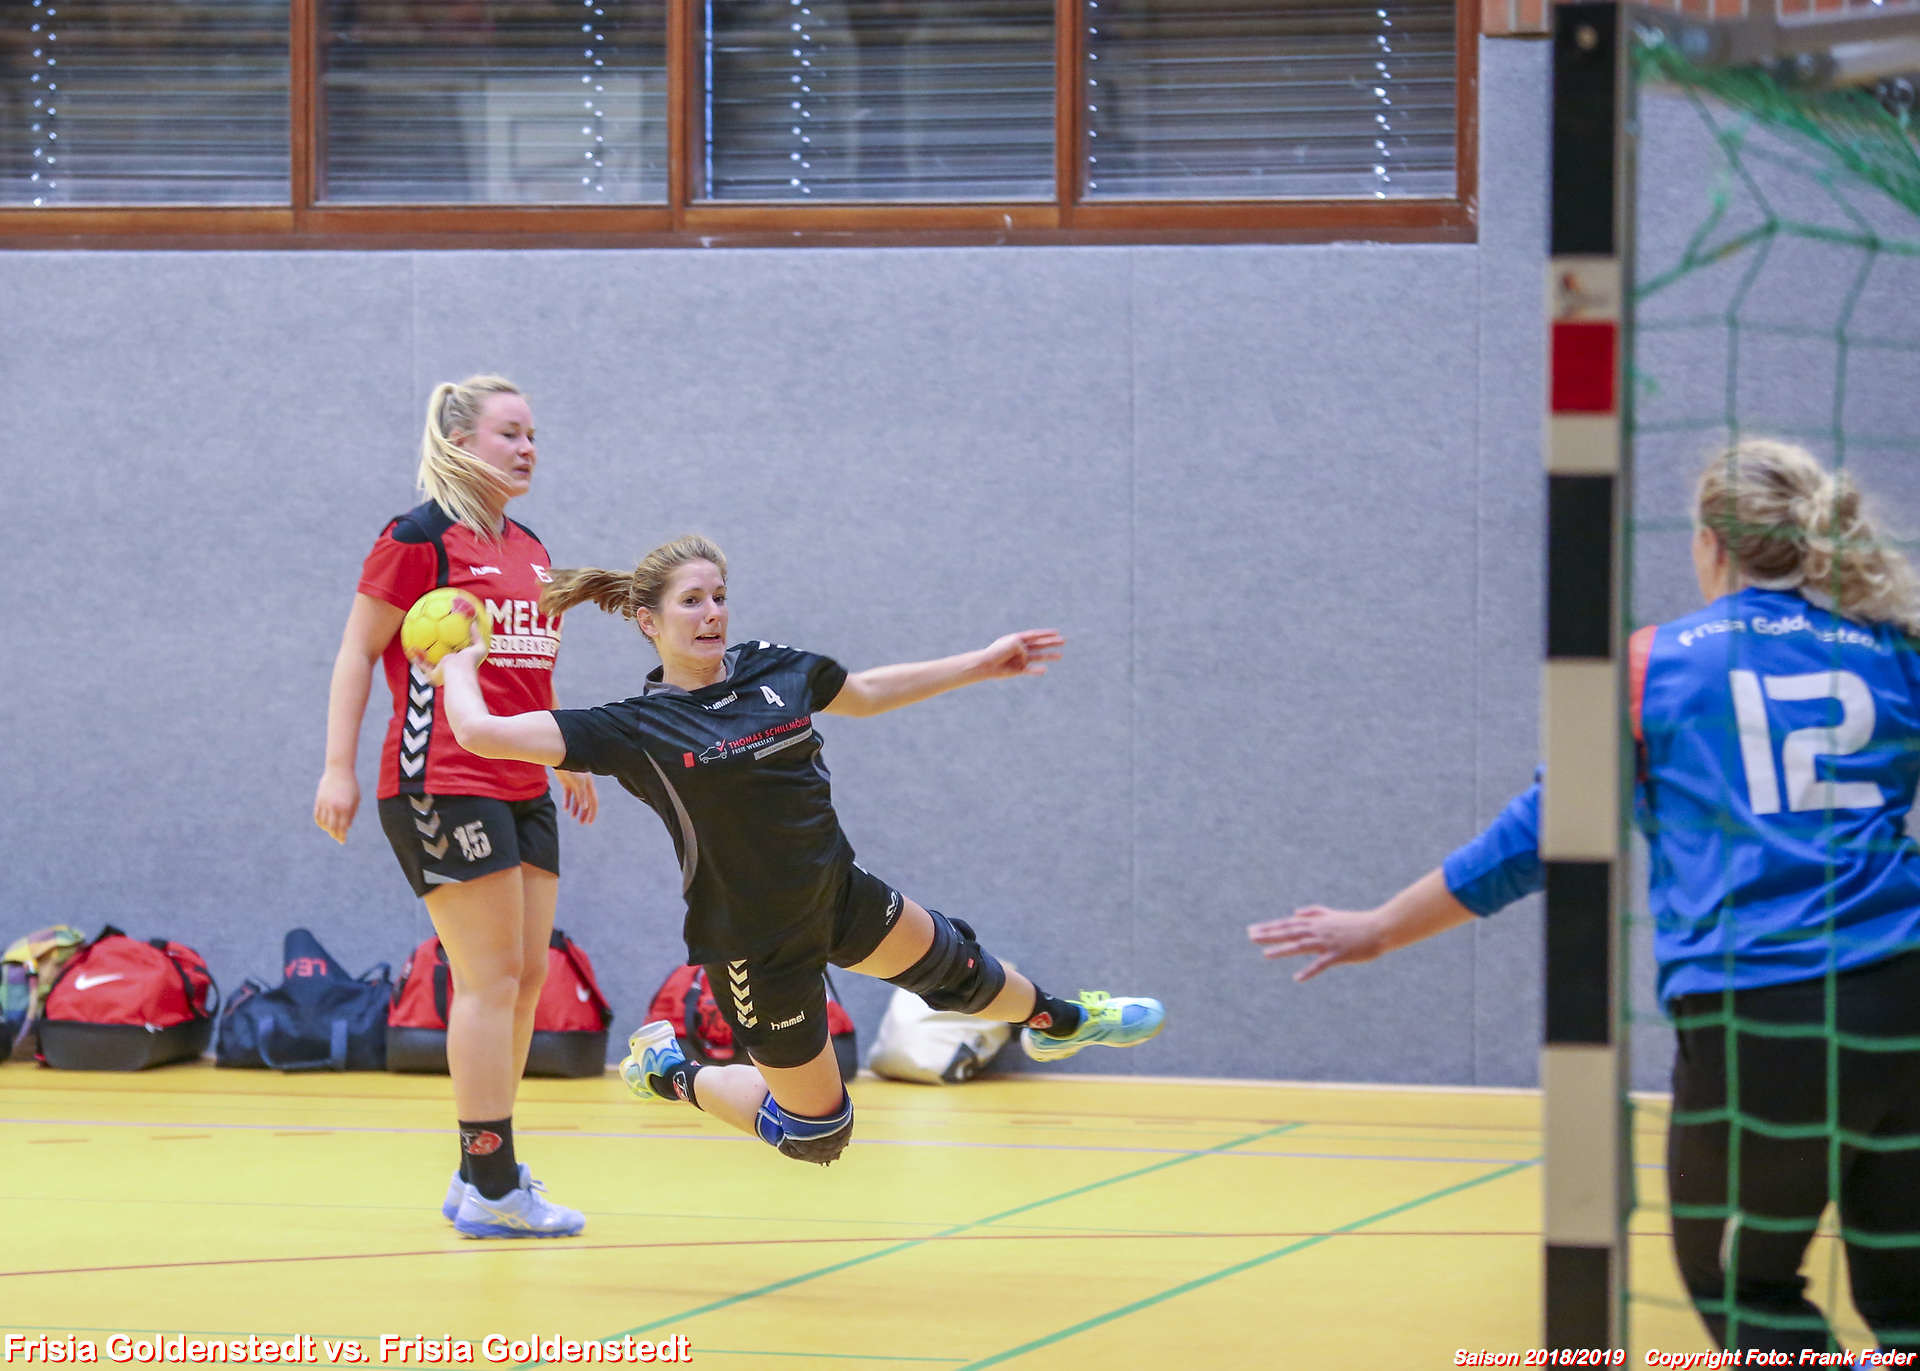 WEB_01-Frisia vs Frisia 2018_09_02_1816_136.jpg